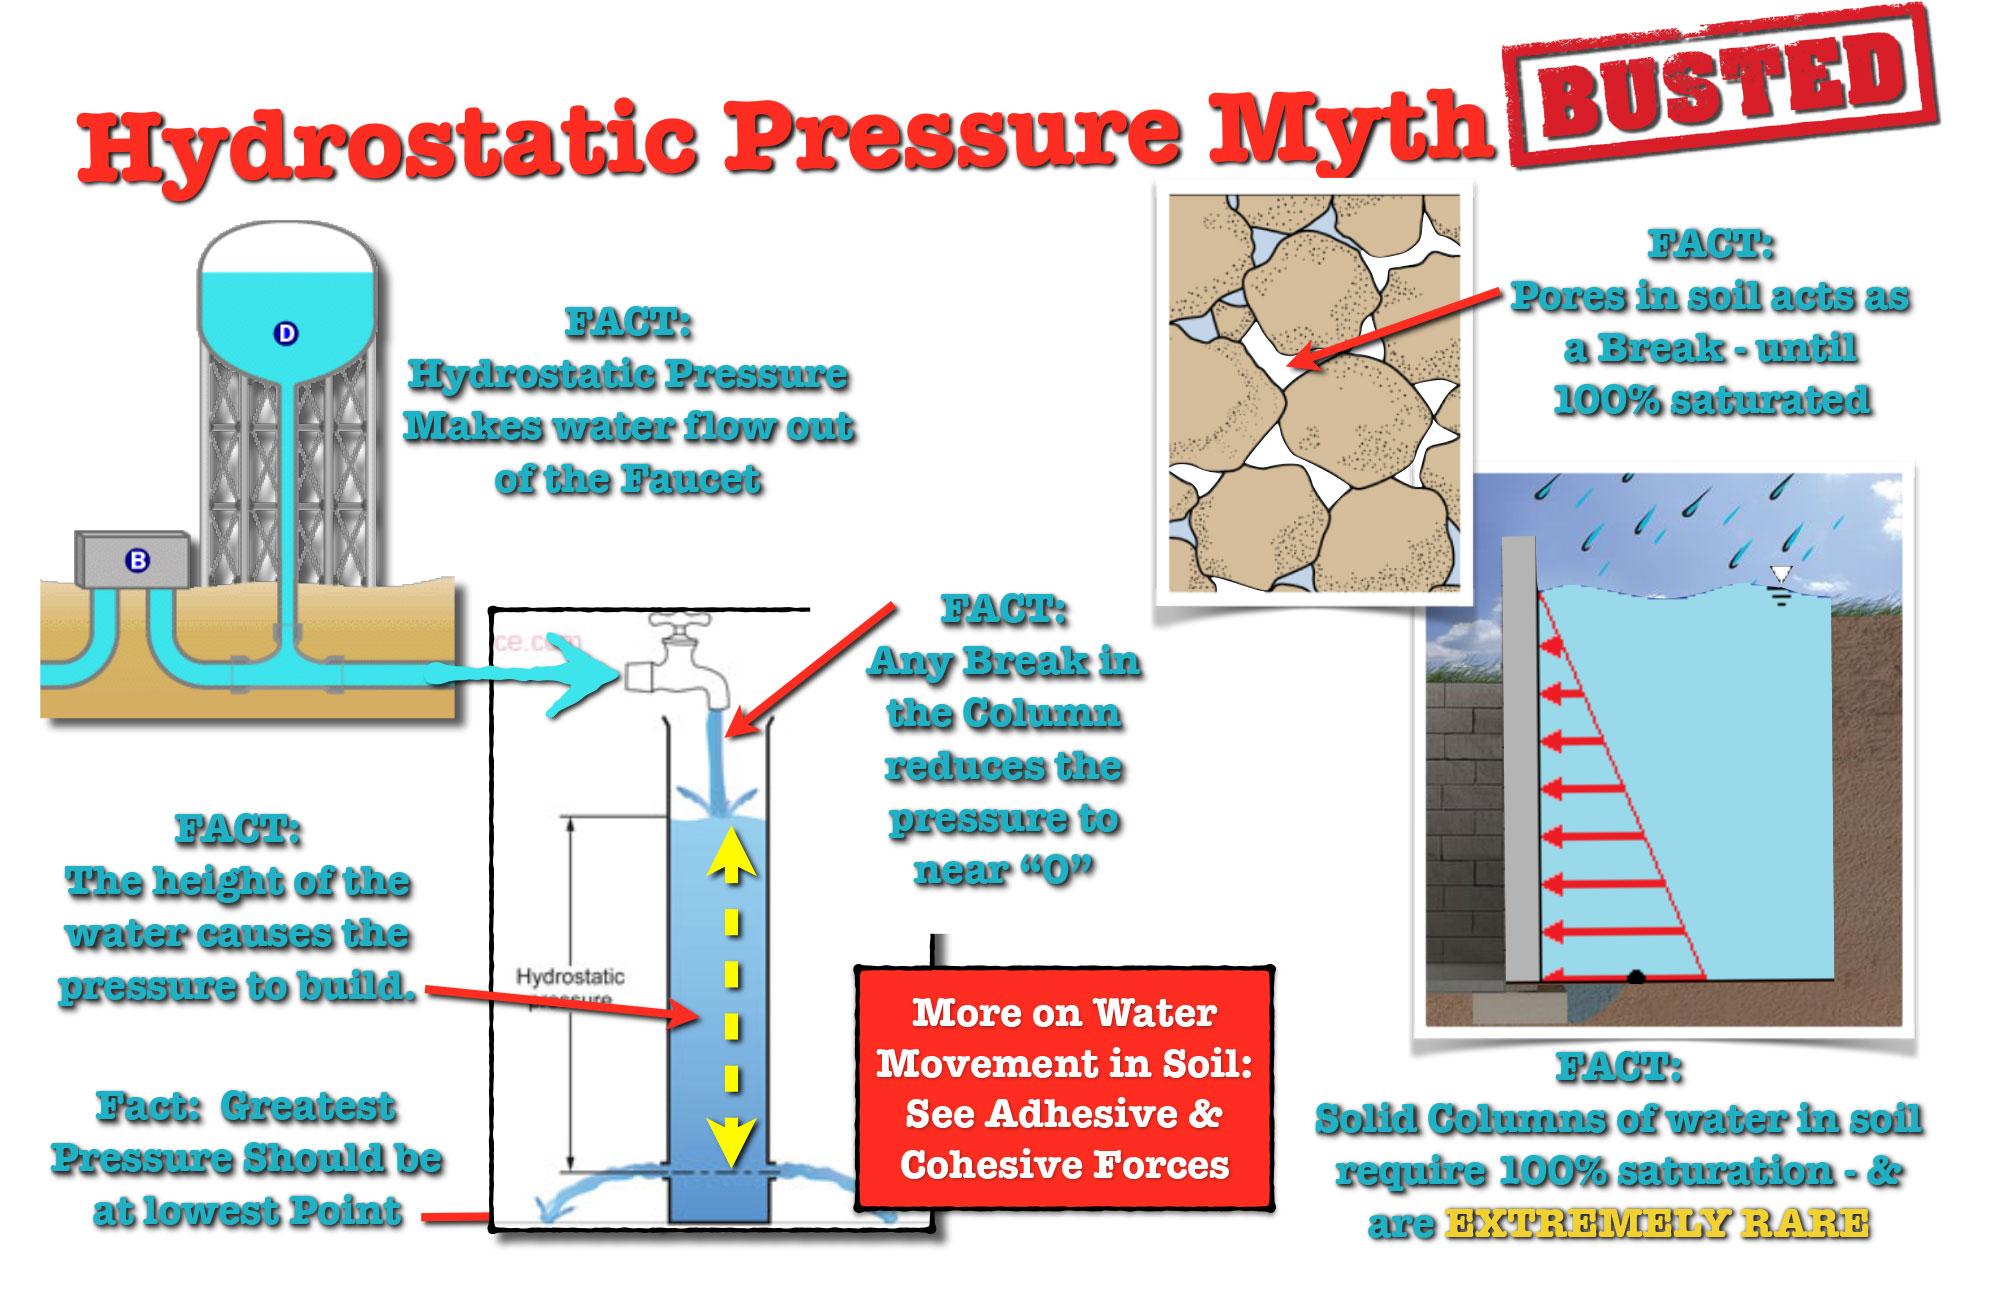 Hydrostatic Pressure Myth